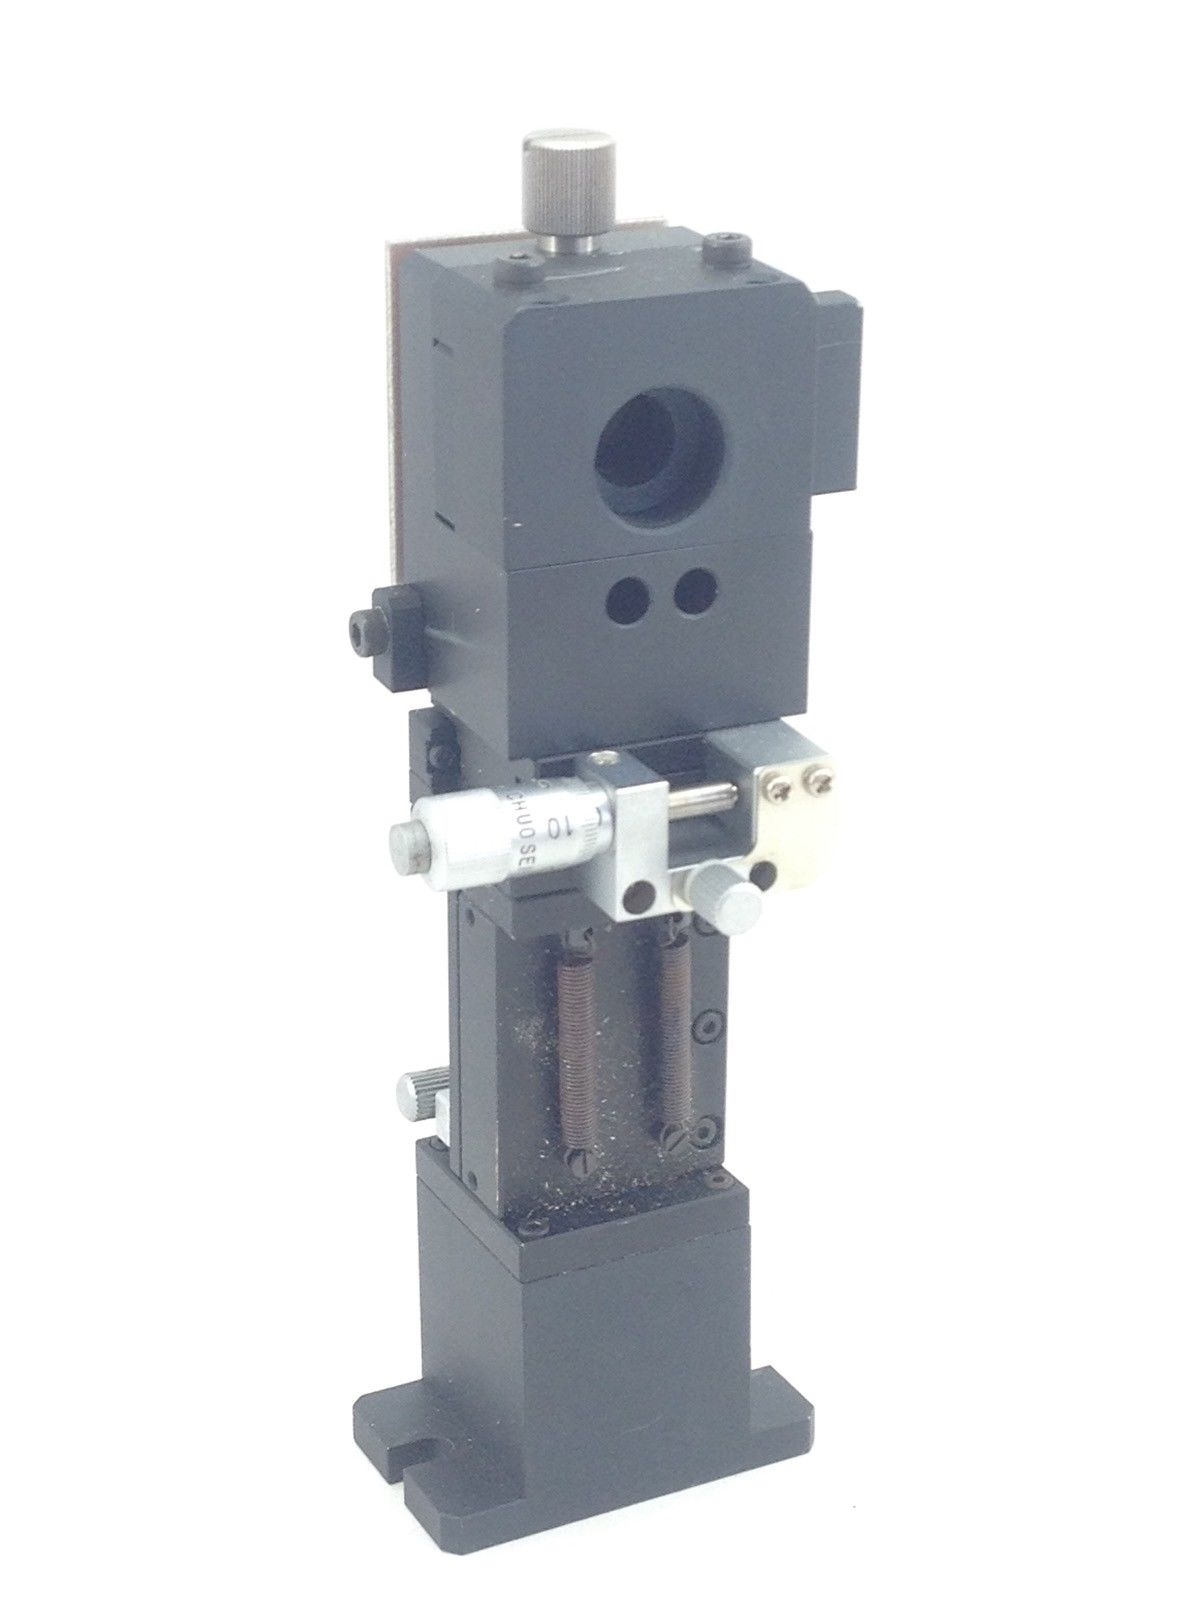 021128 MICRO-CONTROLLER BOARD OPTOMECHANICAL ASSY (H330) 7